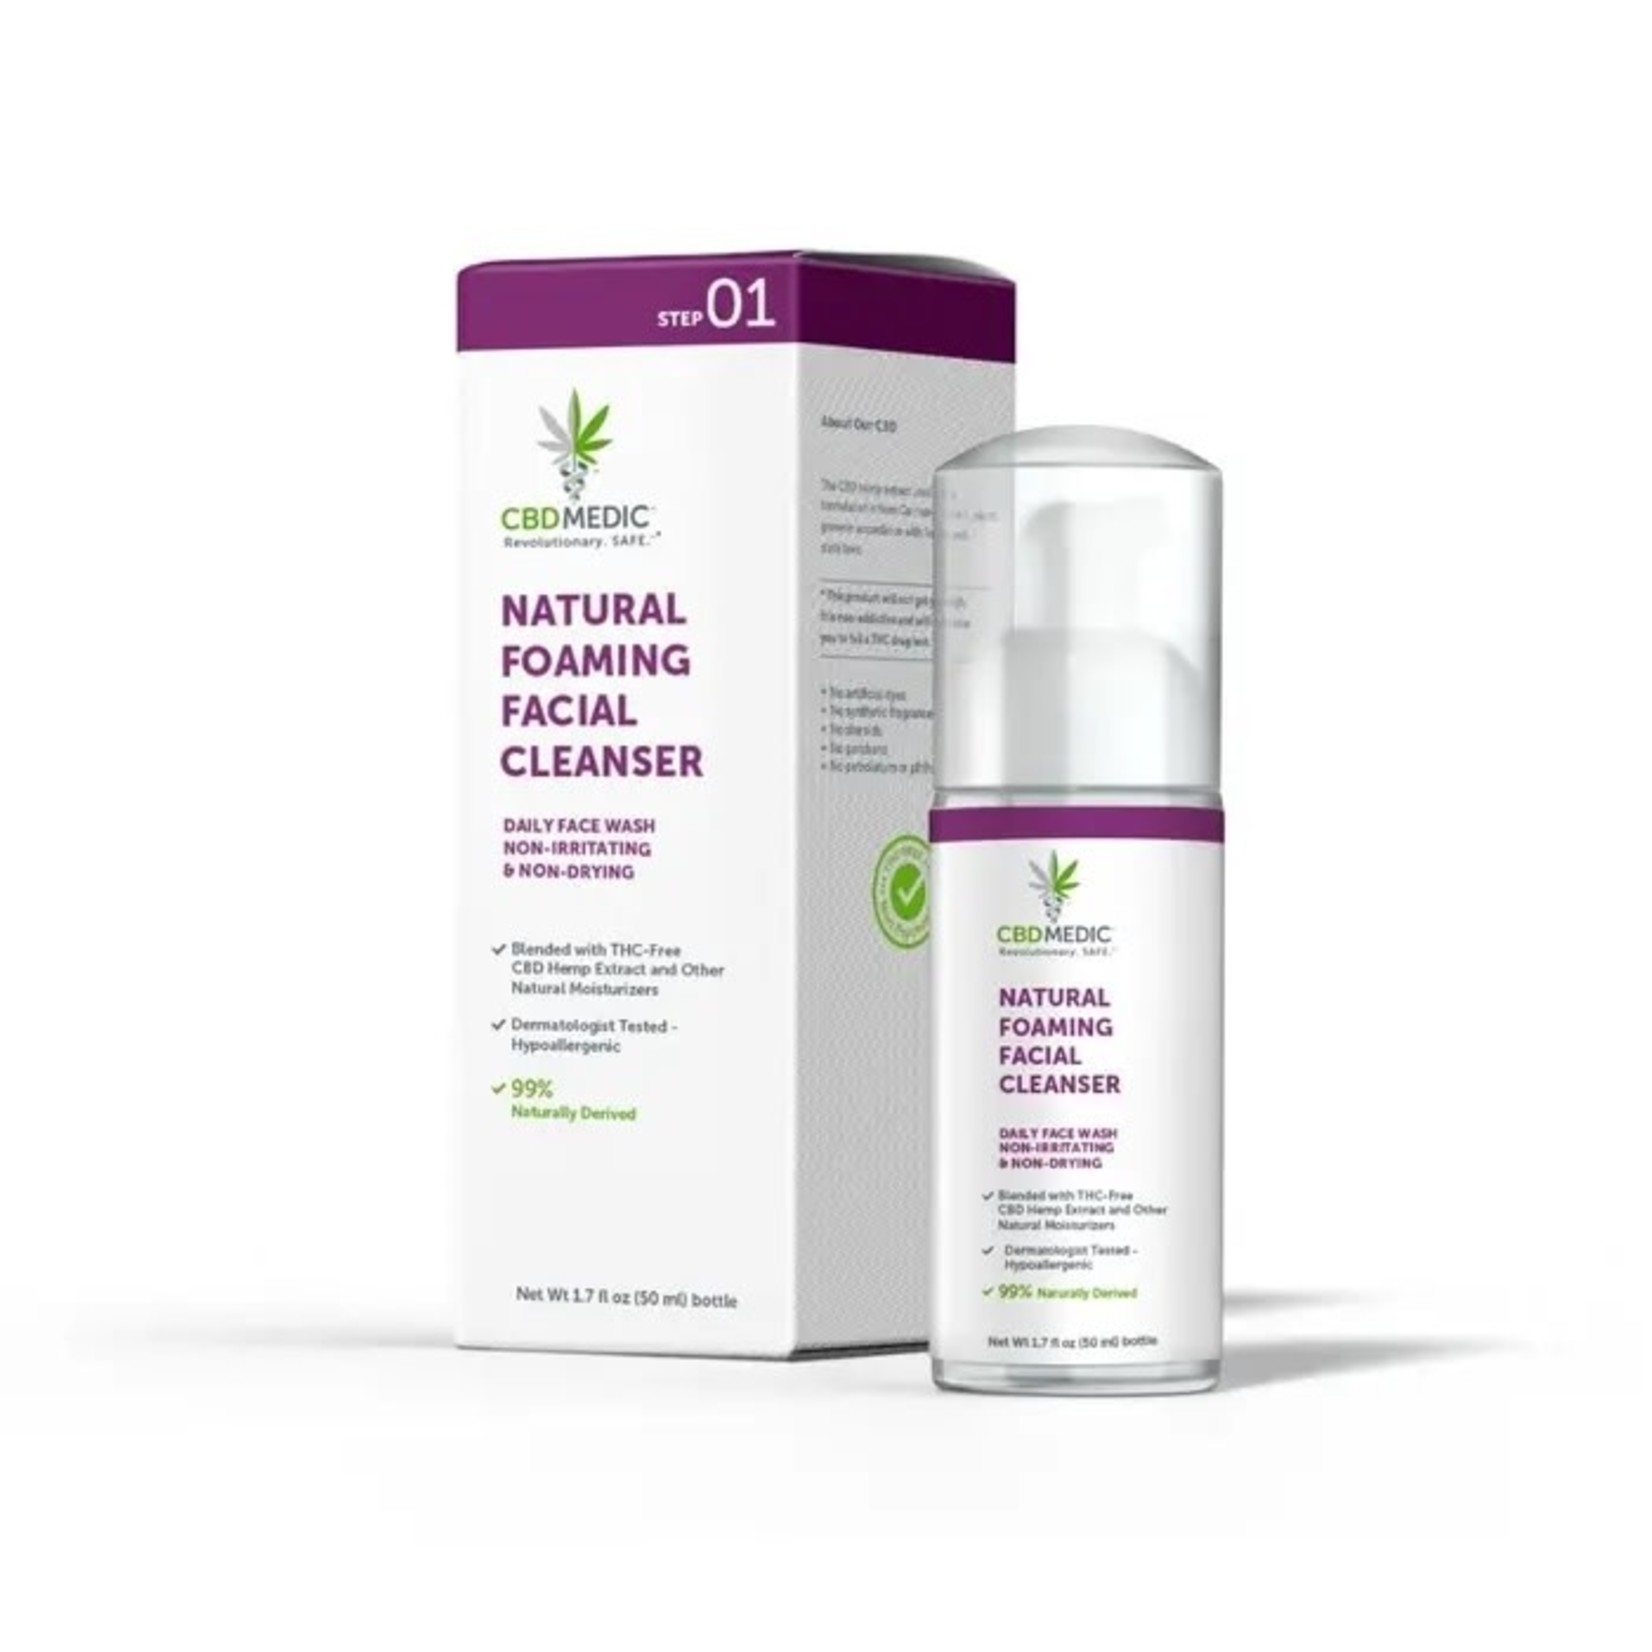 CBD Medic CBD Medic Natural Foaming Acne Facial Cleanser 1.7oz